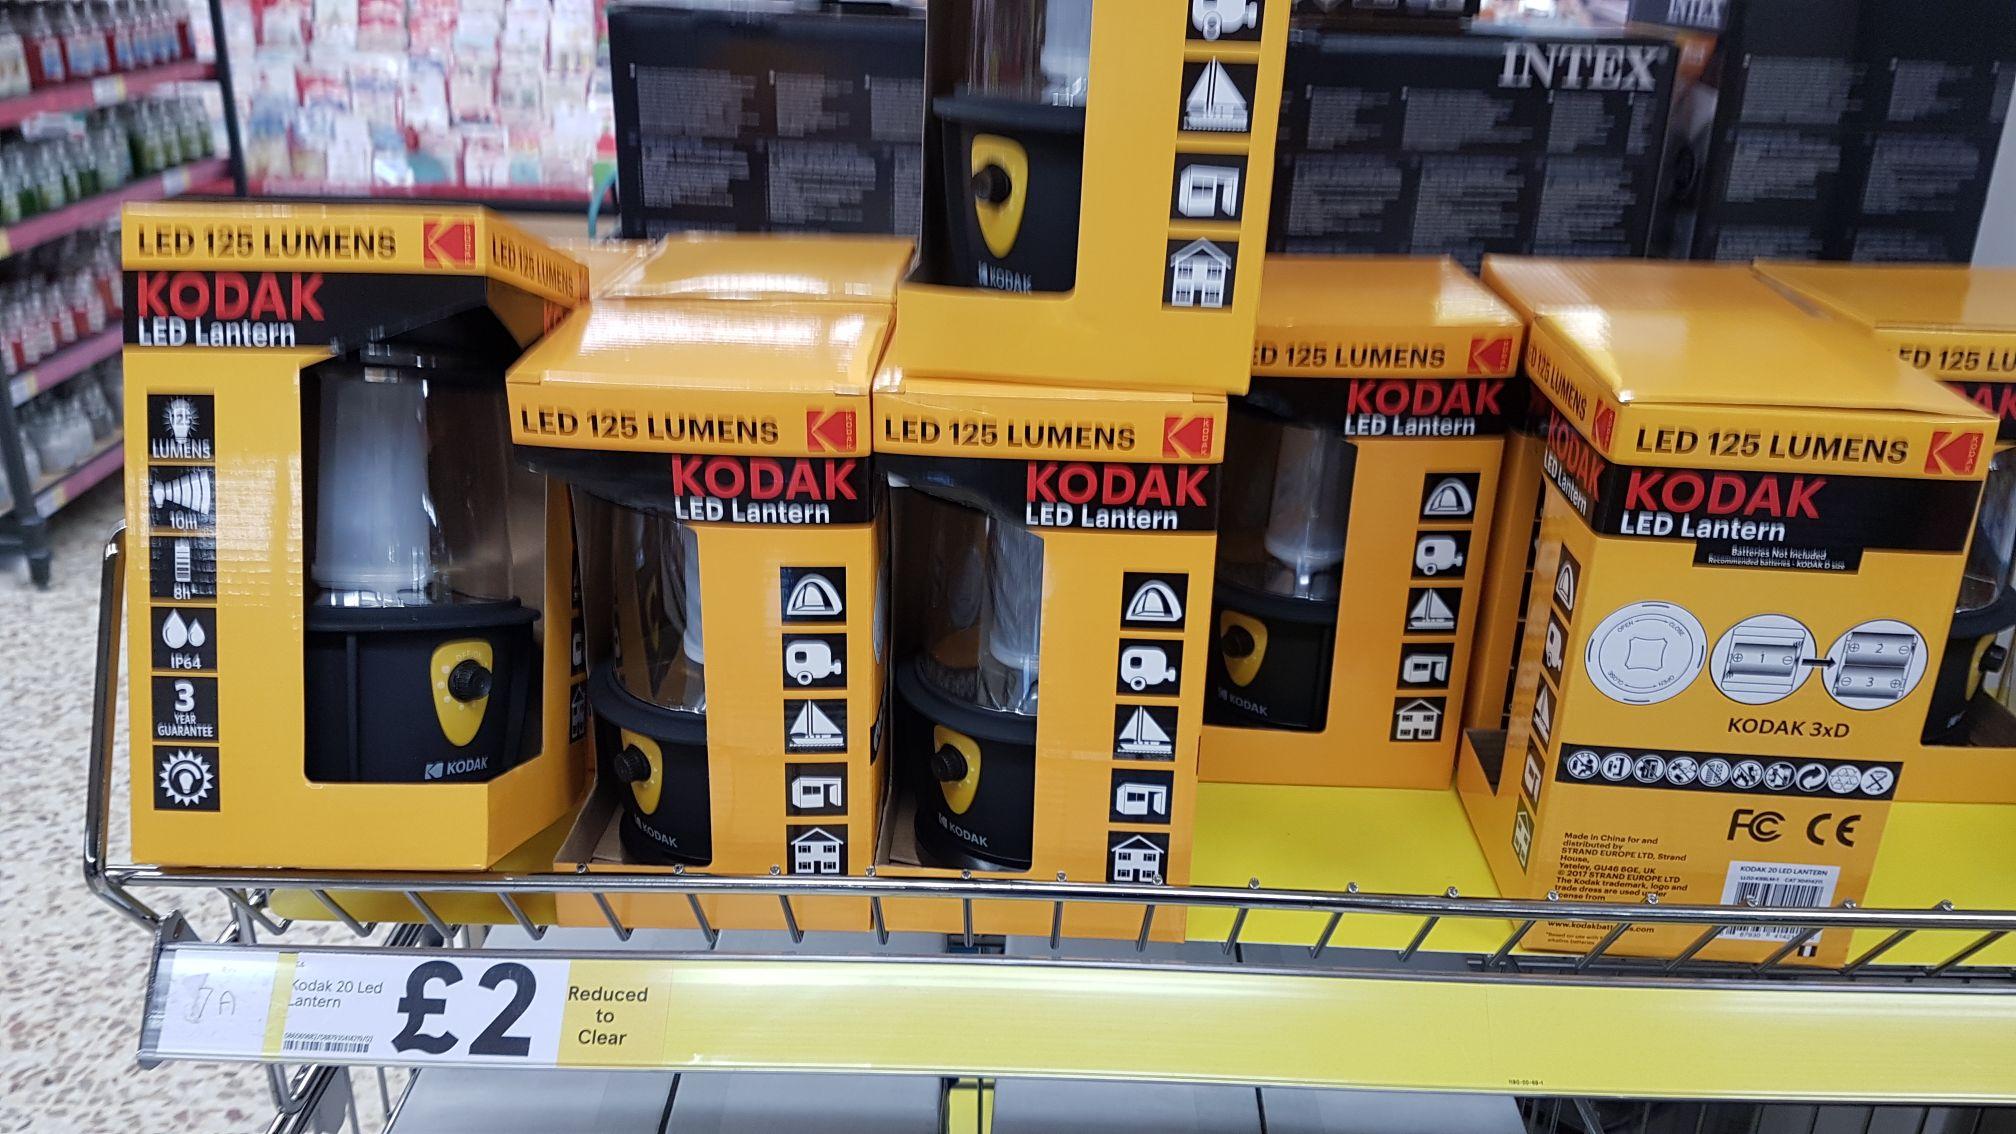 Kodak 20 LED, 125 Lumens lantern £2 instore at Tesco, Milton Keynes (Kingston)